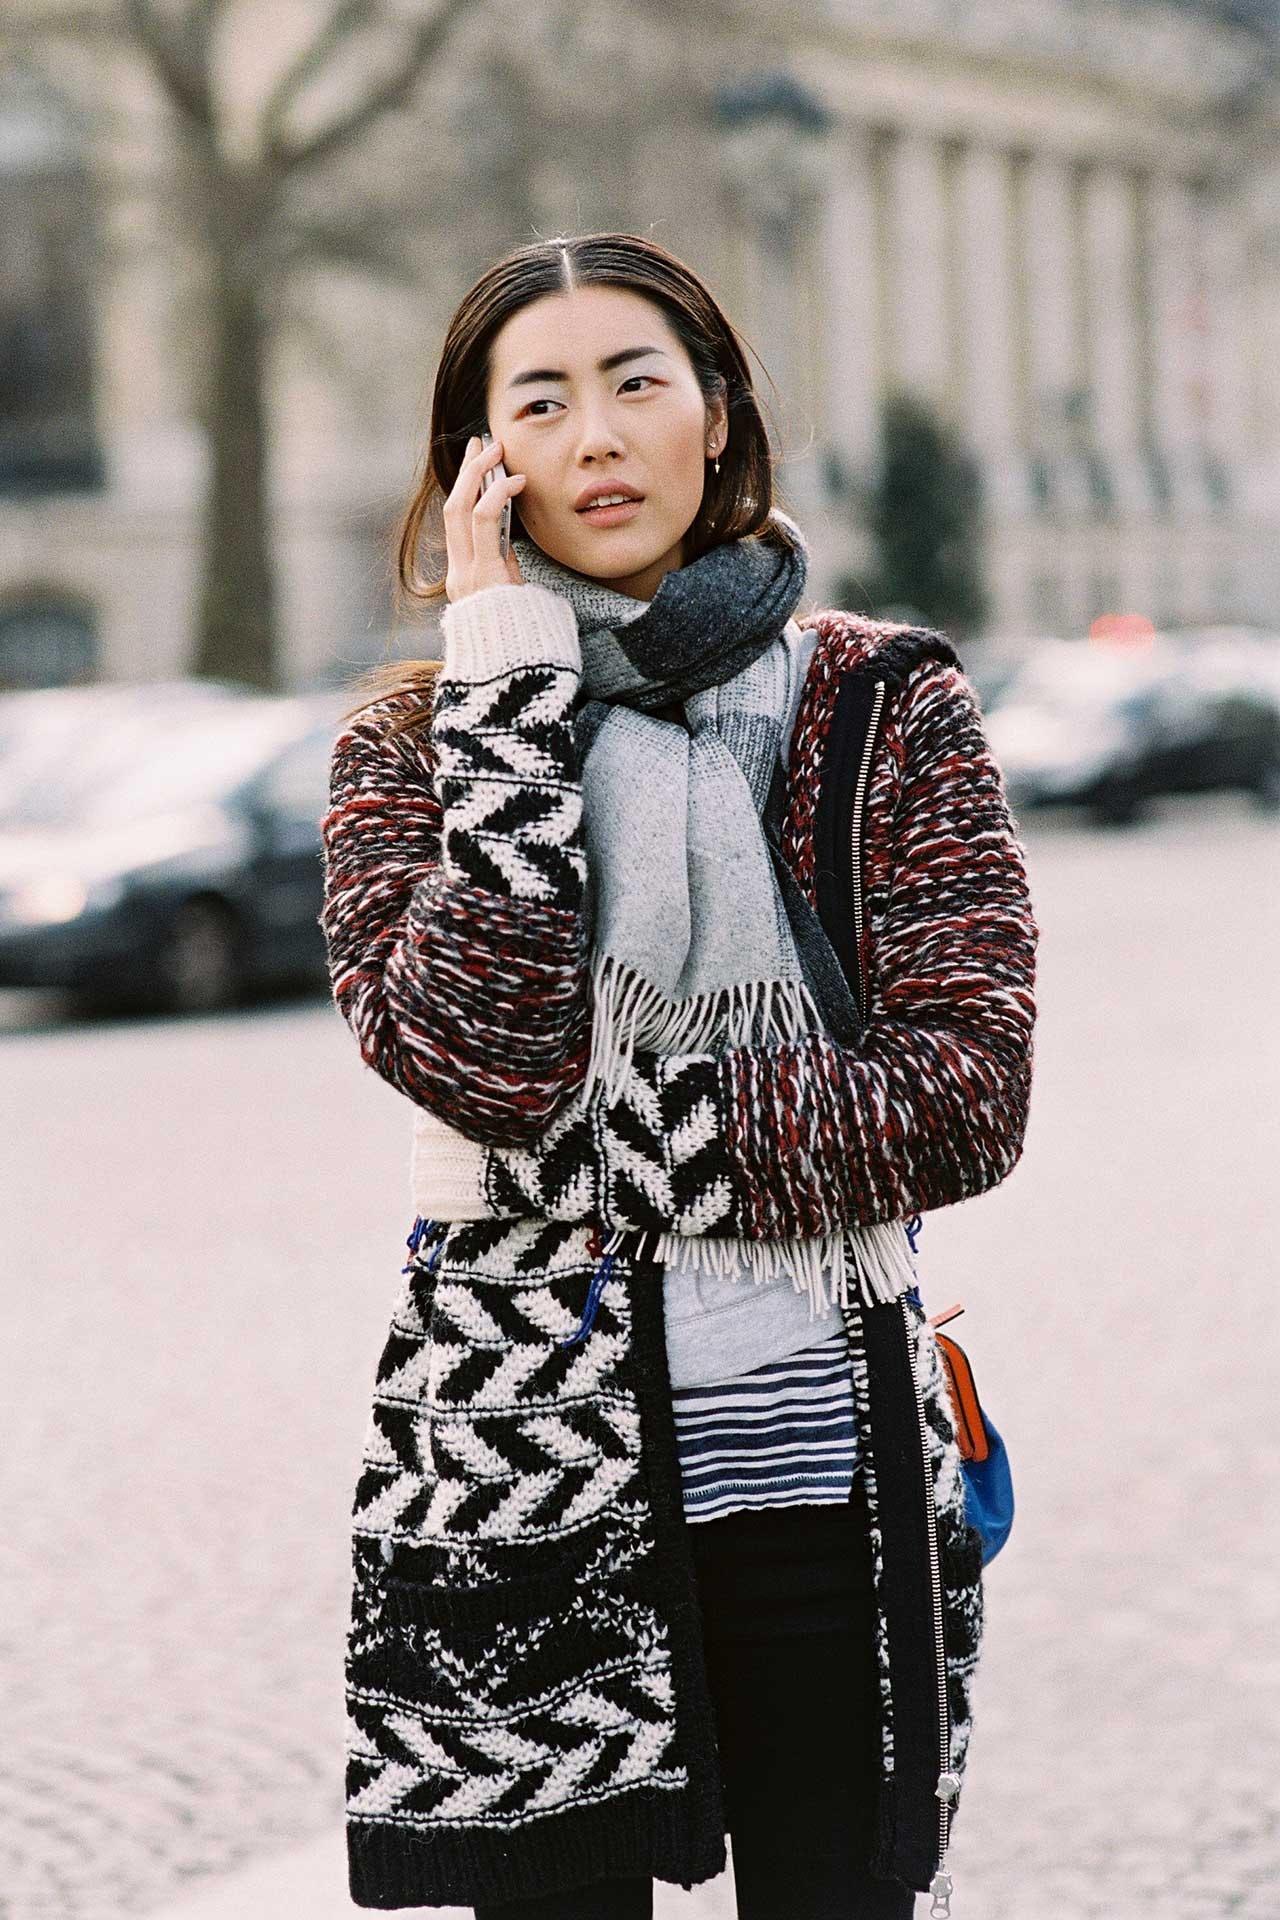 cd797e85a2f 5 Ways to Wear an Oversized Cardigan